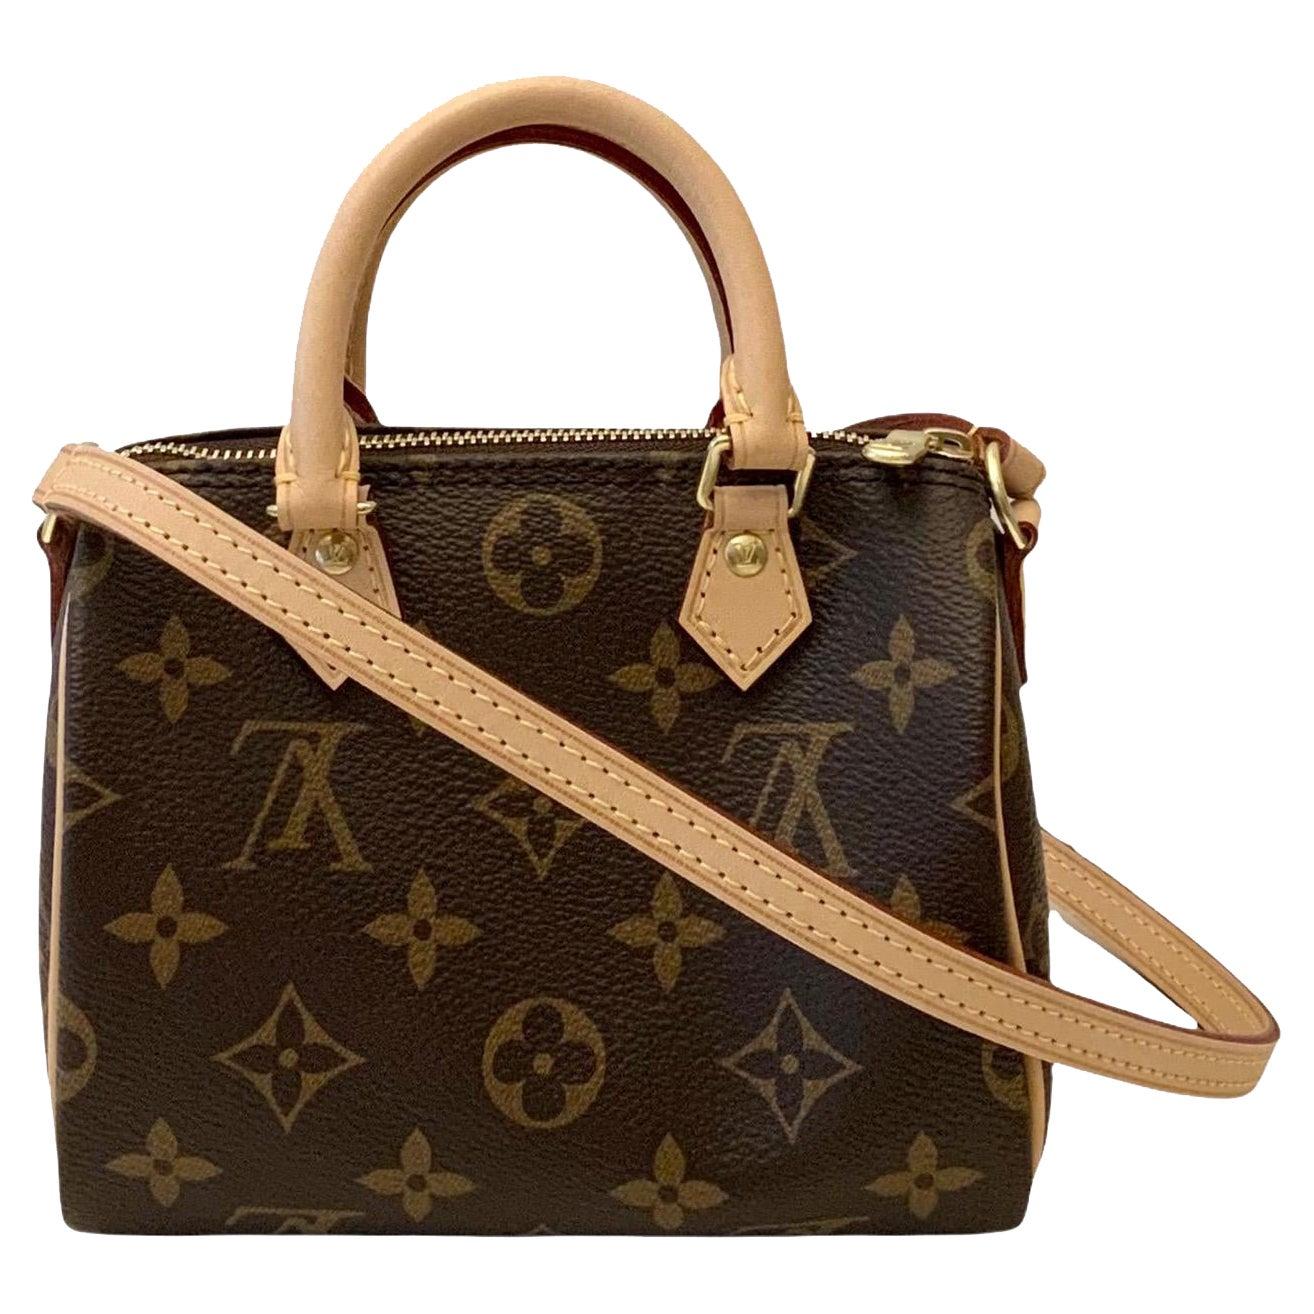 Louis Vuitton Monogram Nano Speedy Bag